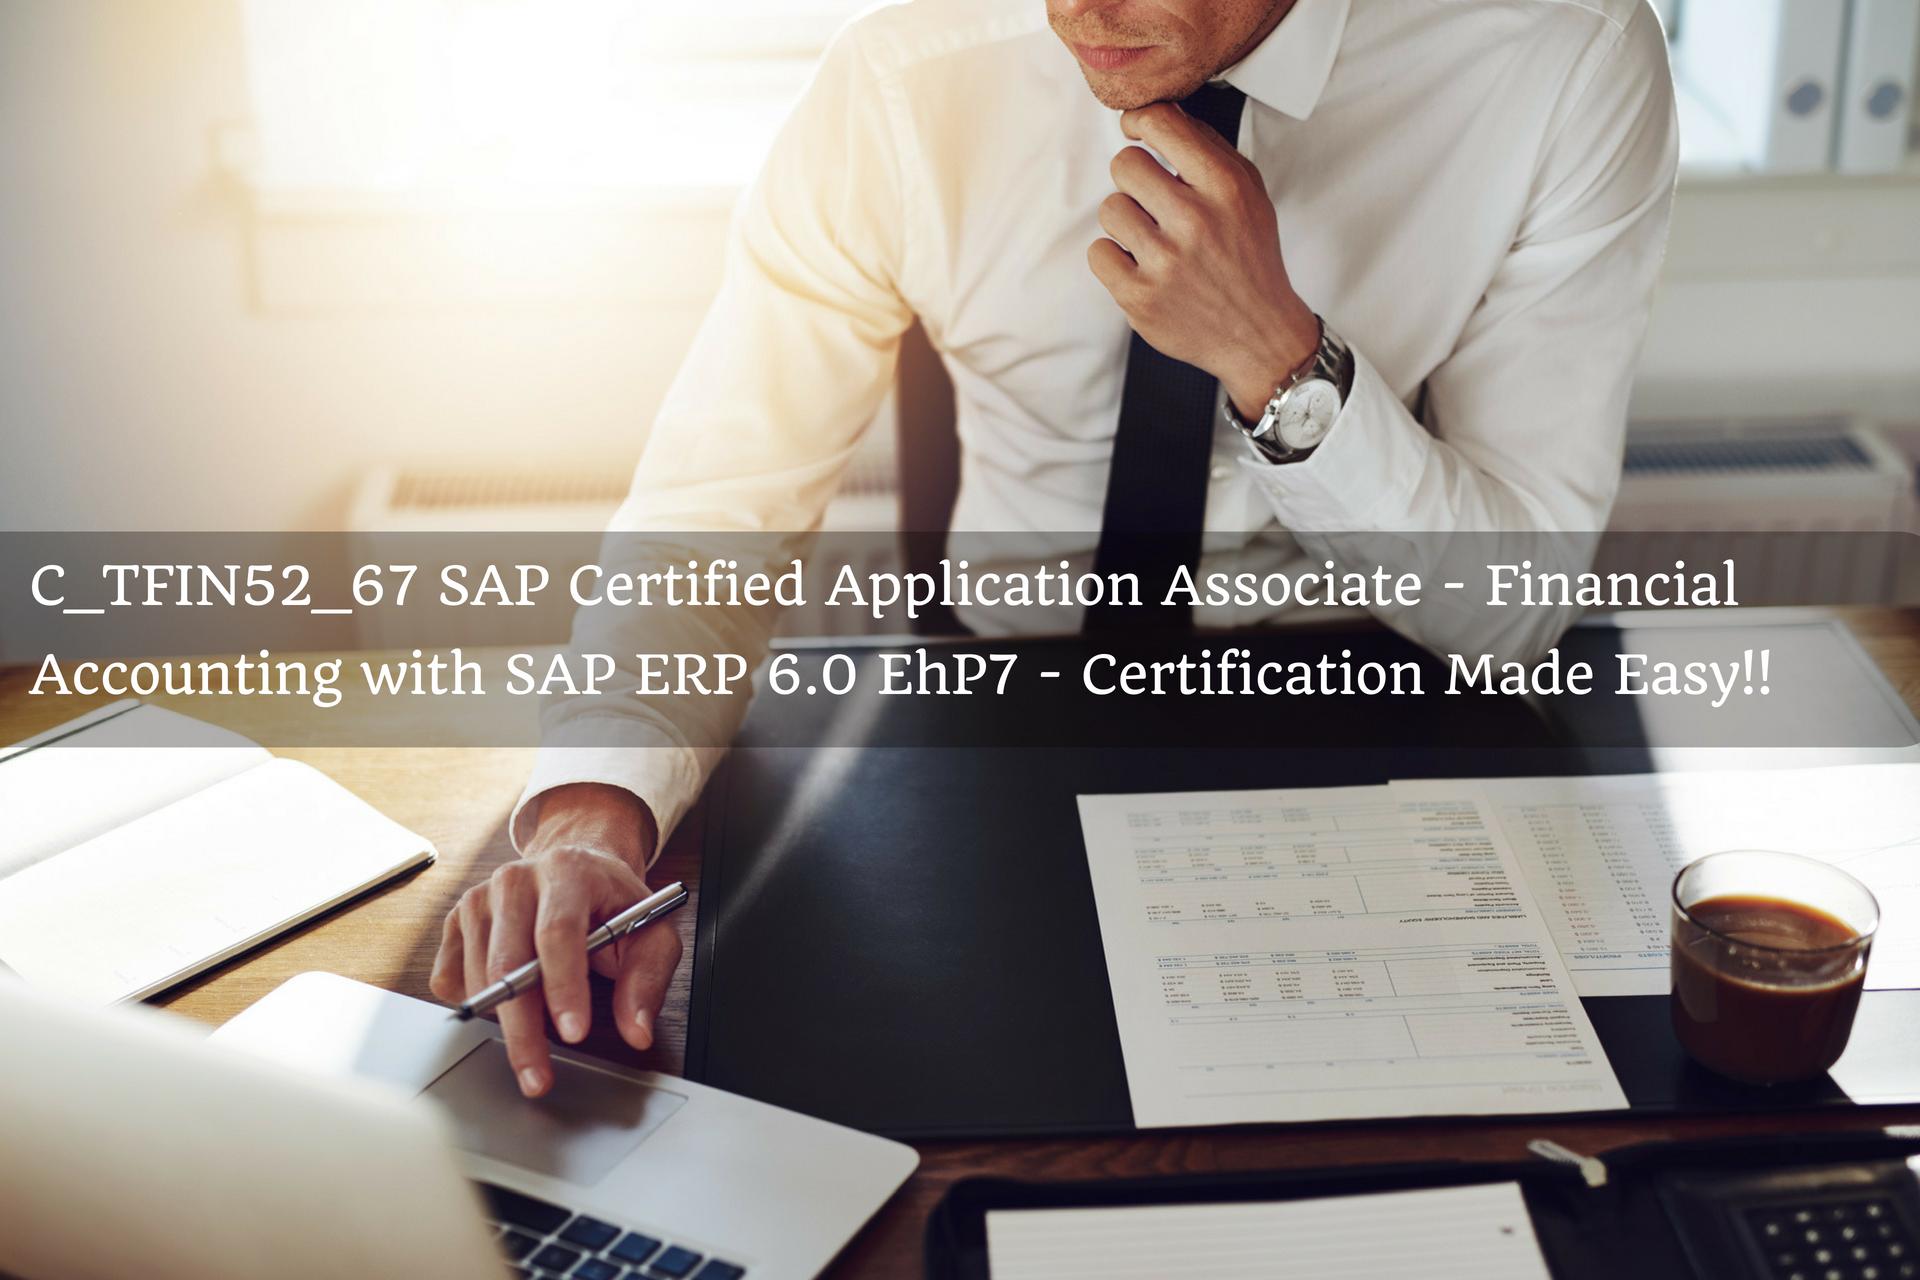 C_TFIN52_67 SAP Certified Application Associate - Financial